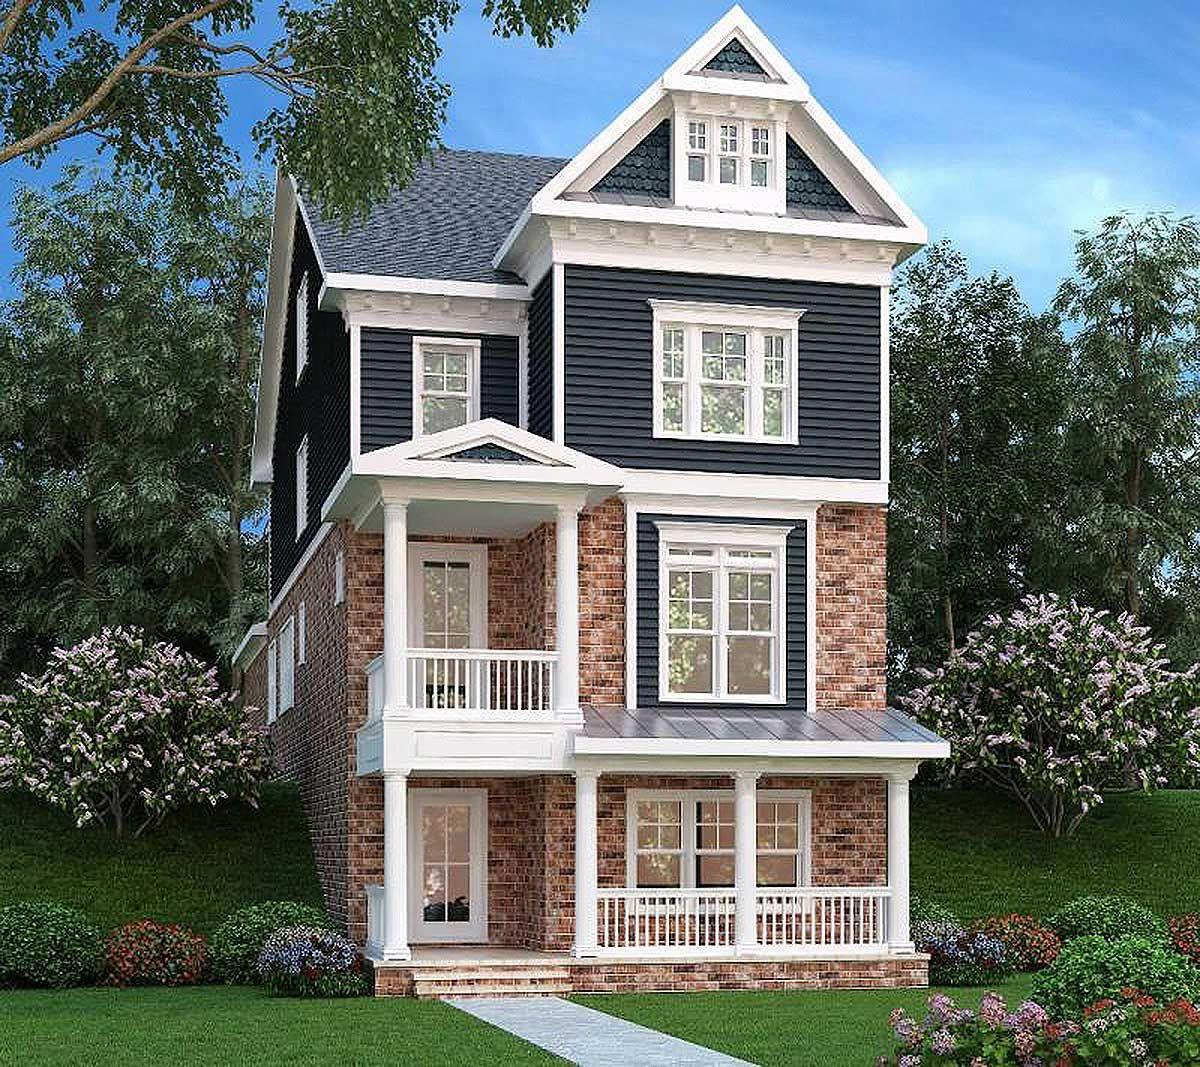 Plan 75553gb Narrow Lot Home 3 Level Living Narrow House Plans Garage House Plans Narrow Lot House Plans